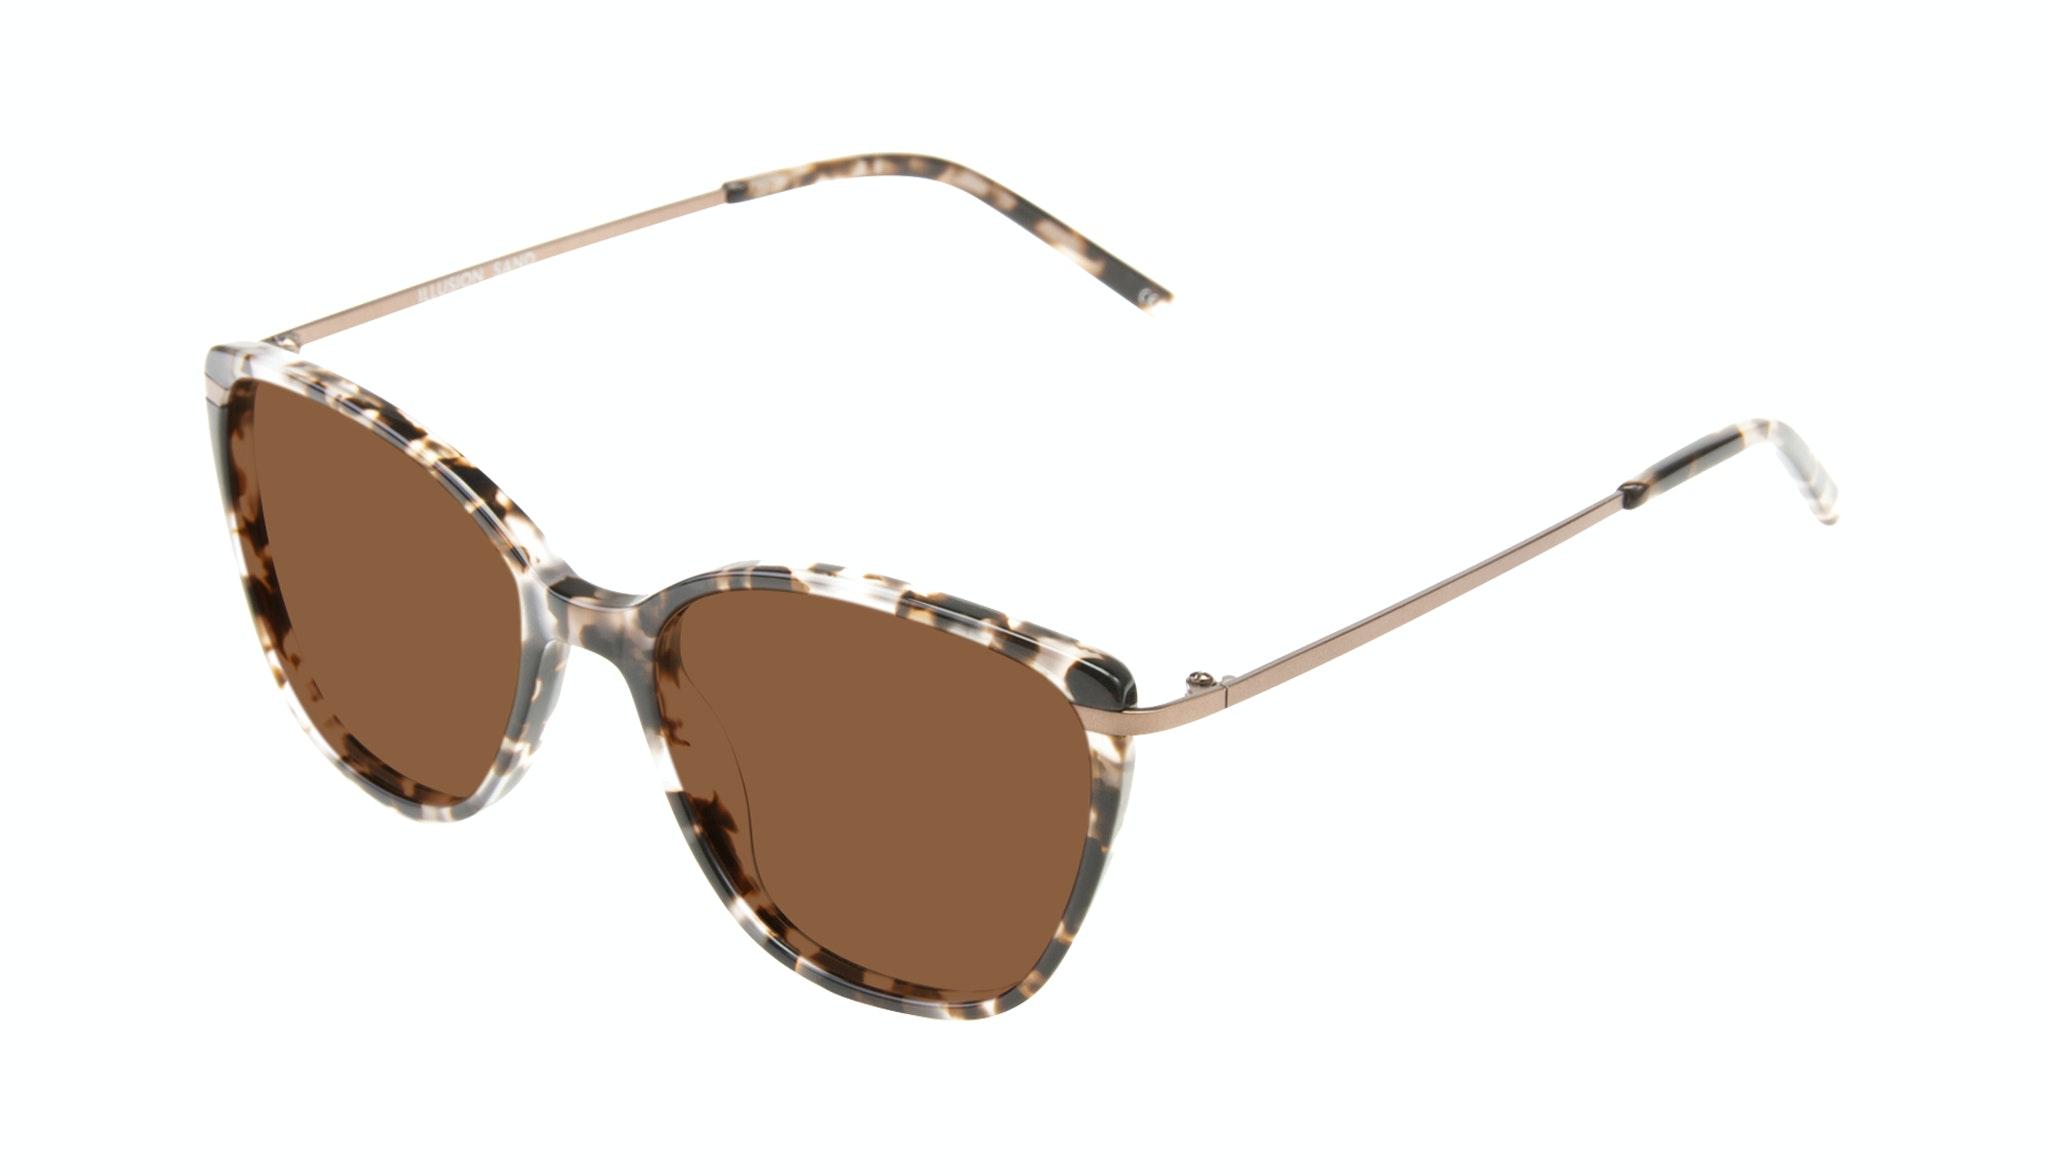 Affordable Fashion Glasses Cat Eye Rectangle Square Sunglasses Women Illusion Sand Tilt